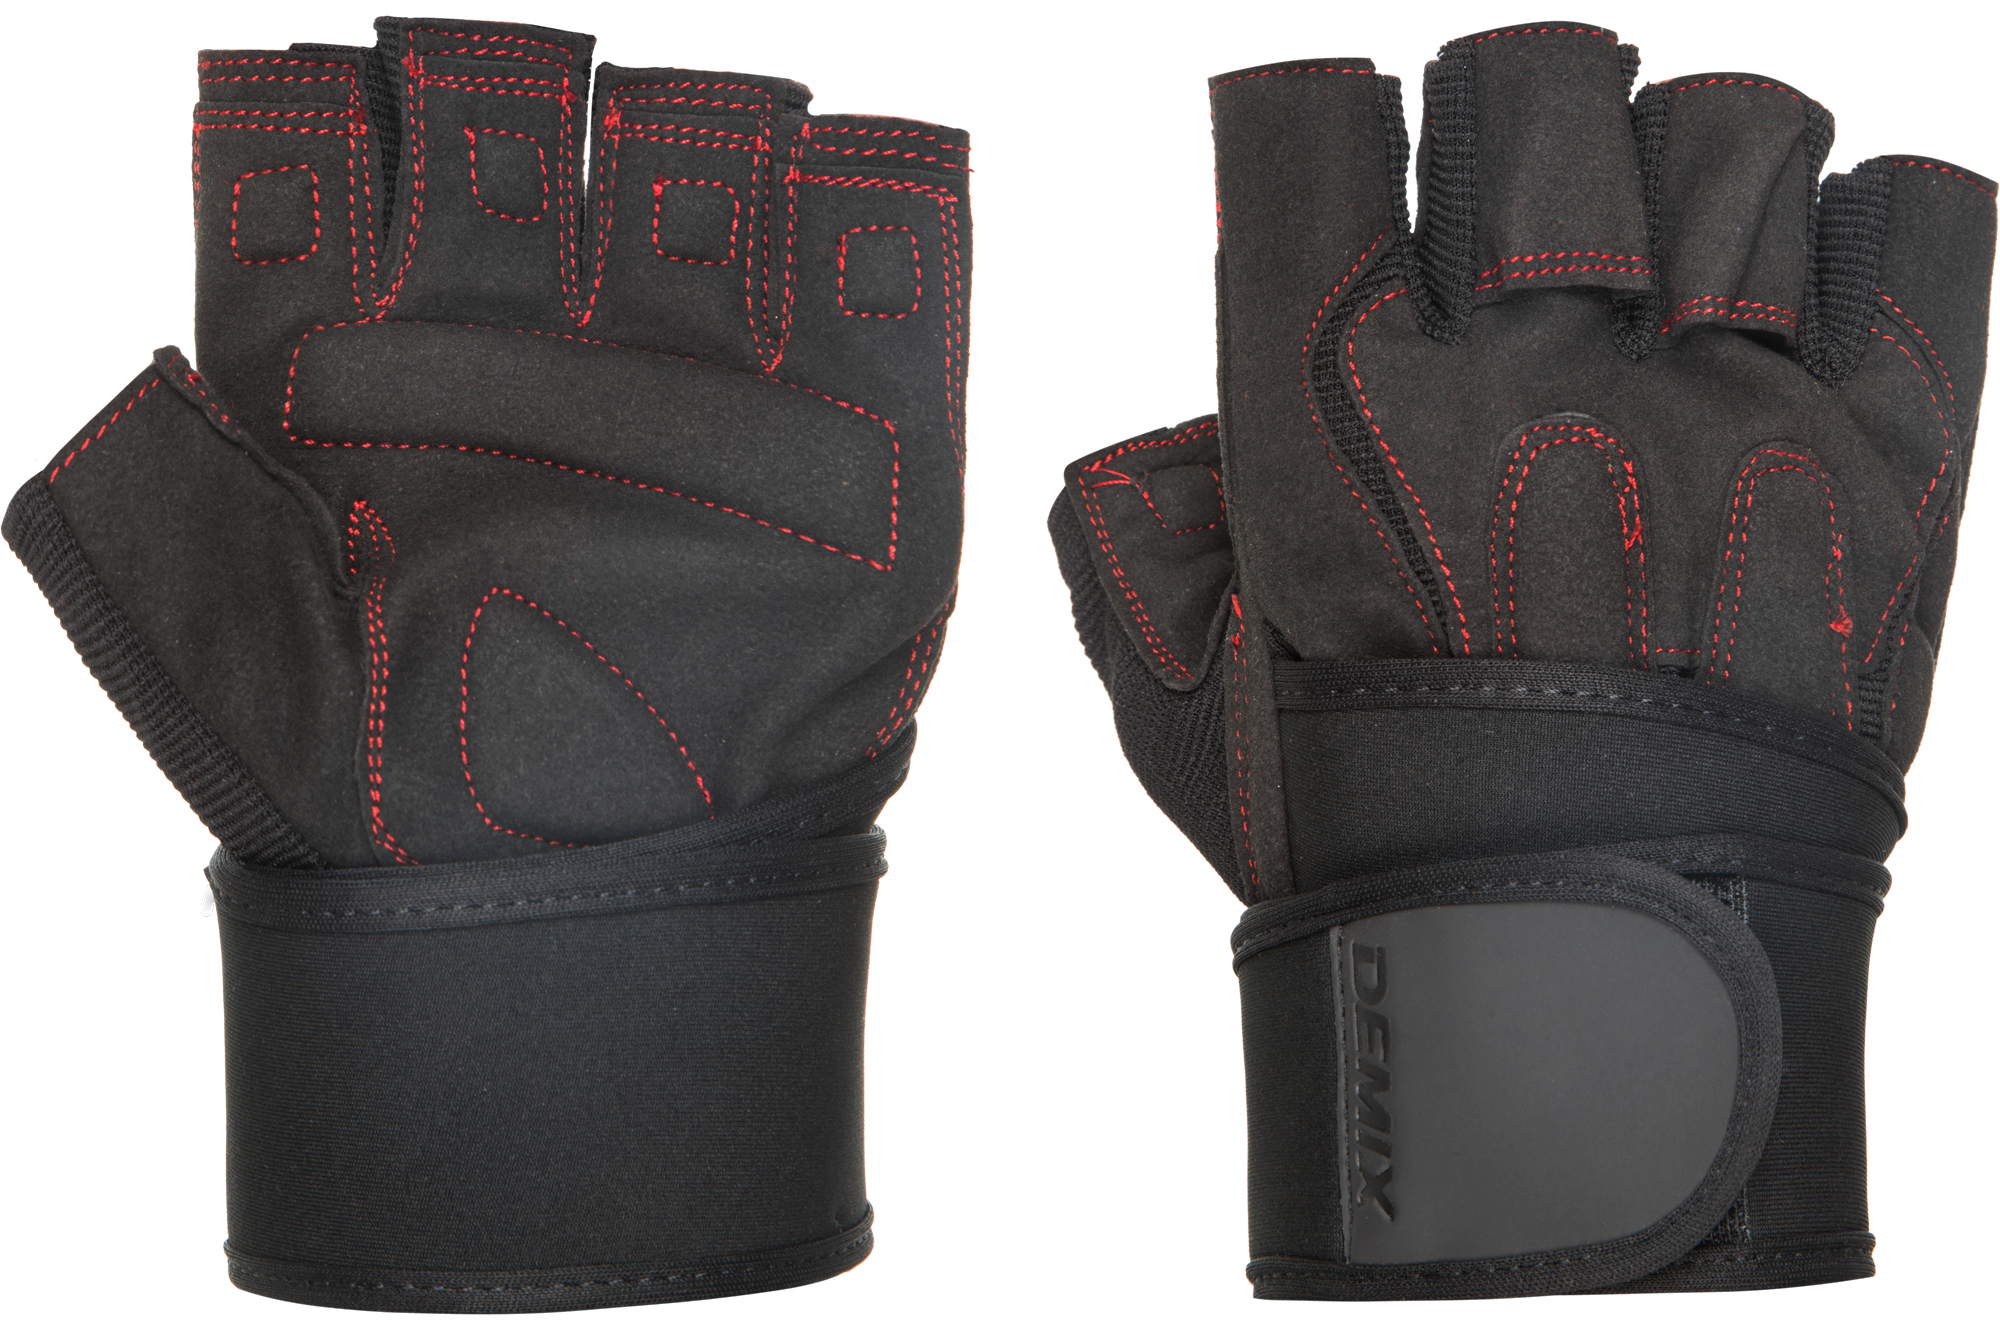 Demix Перчатки атлетические с фиксатором Fitness Gloves With Wrist Strap, размер 54